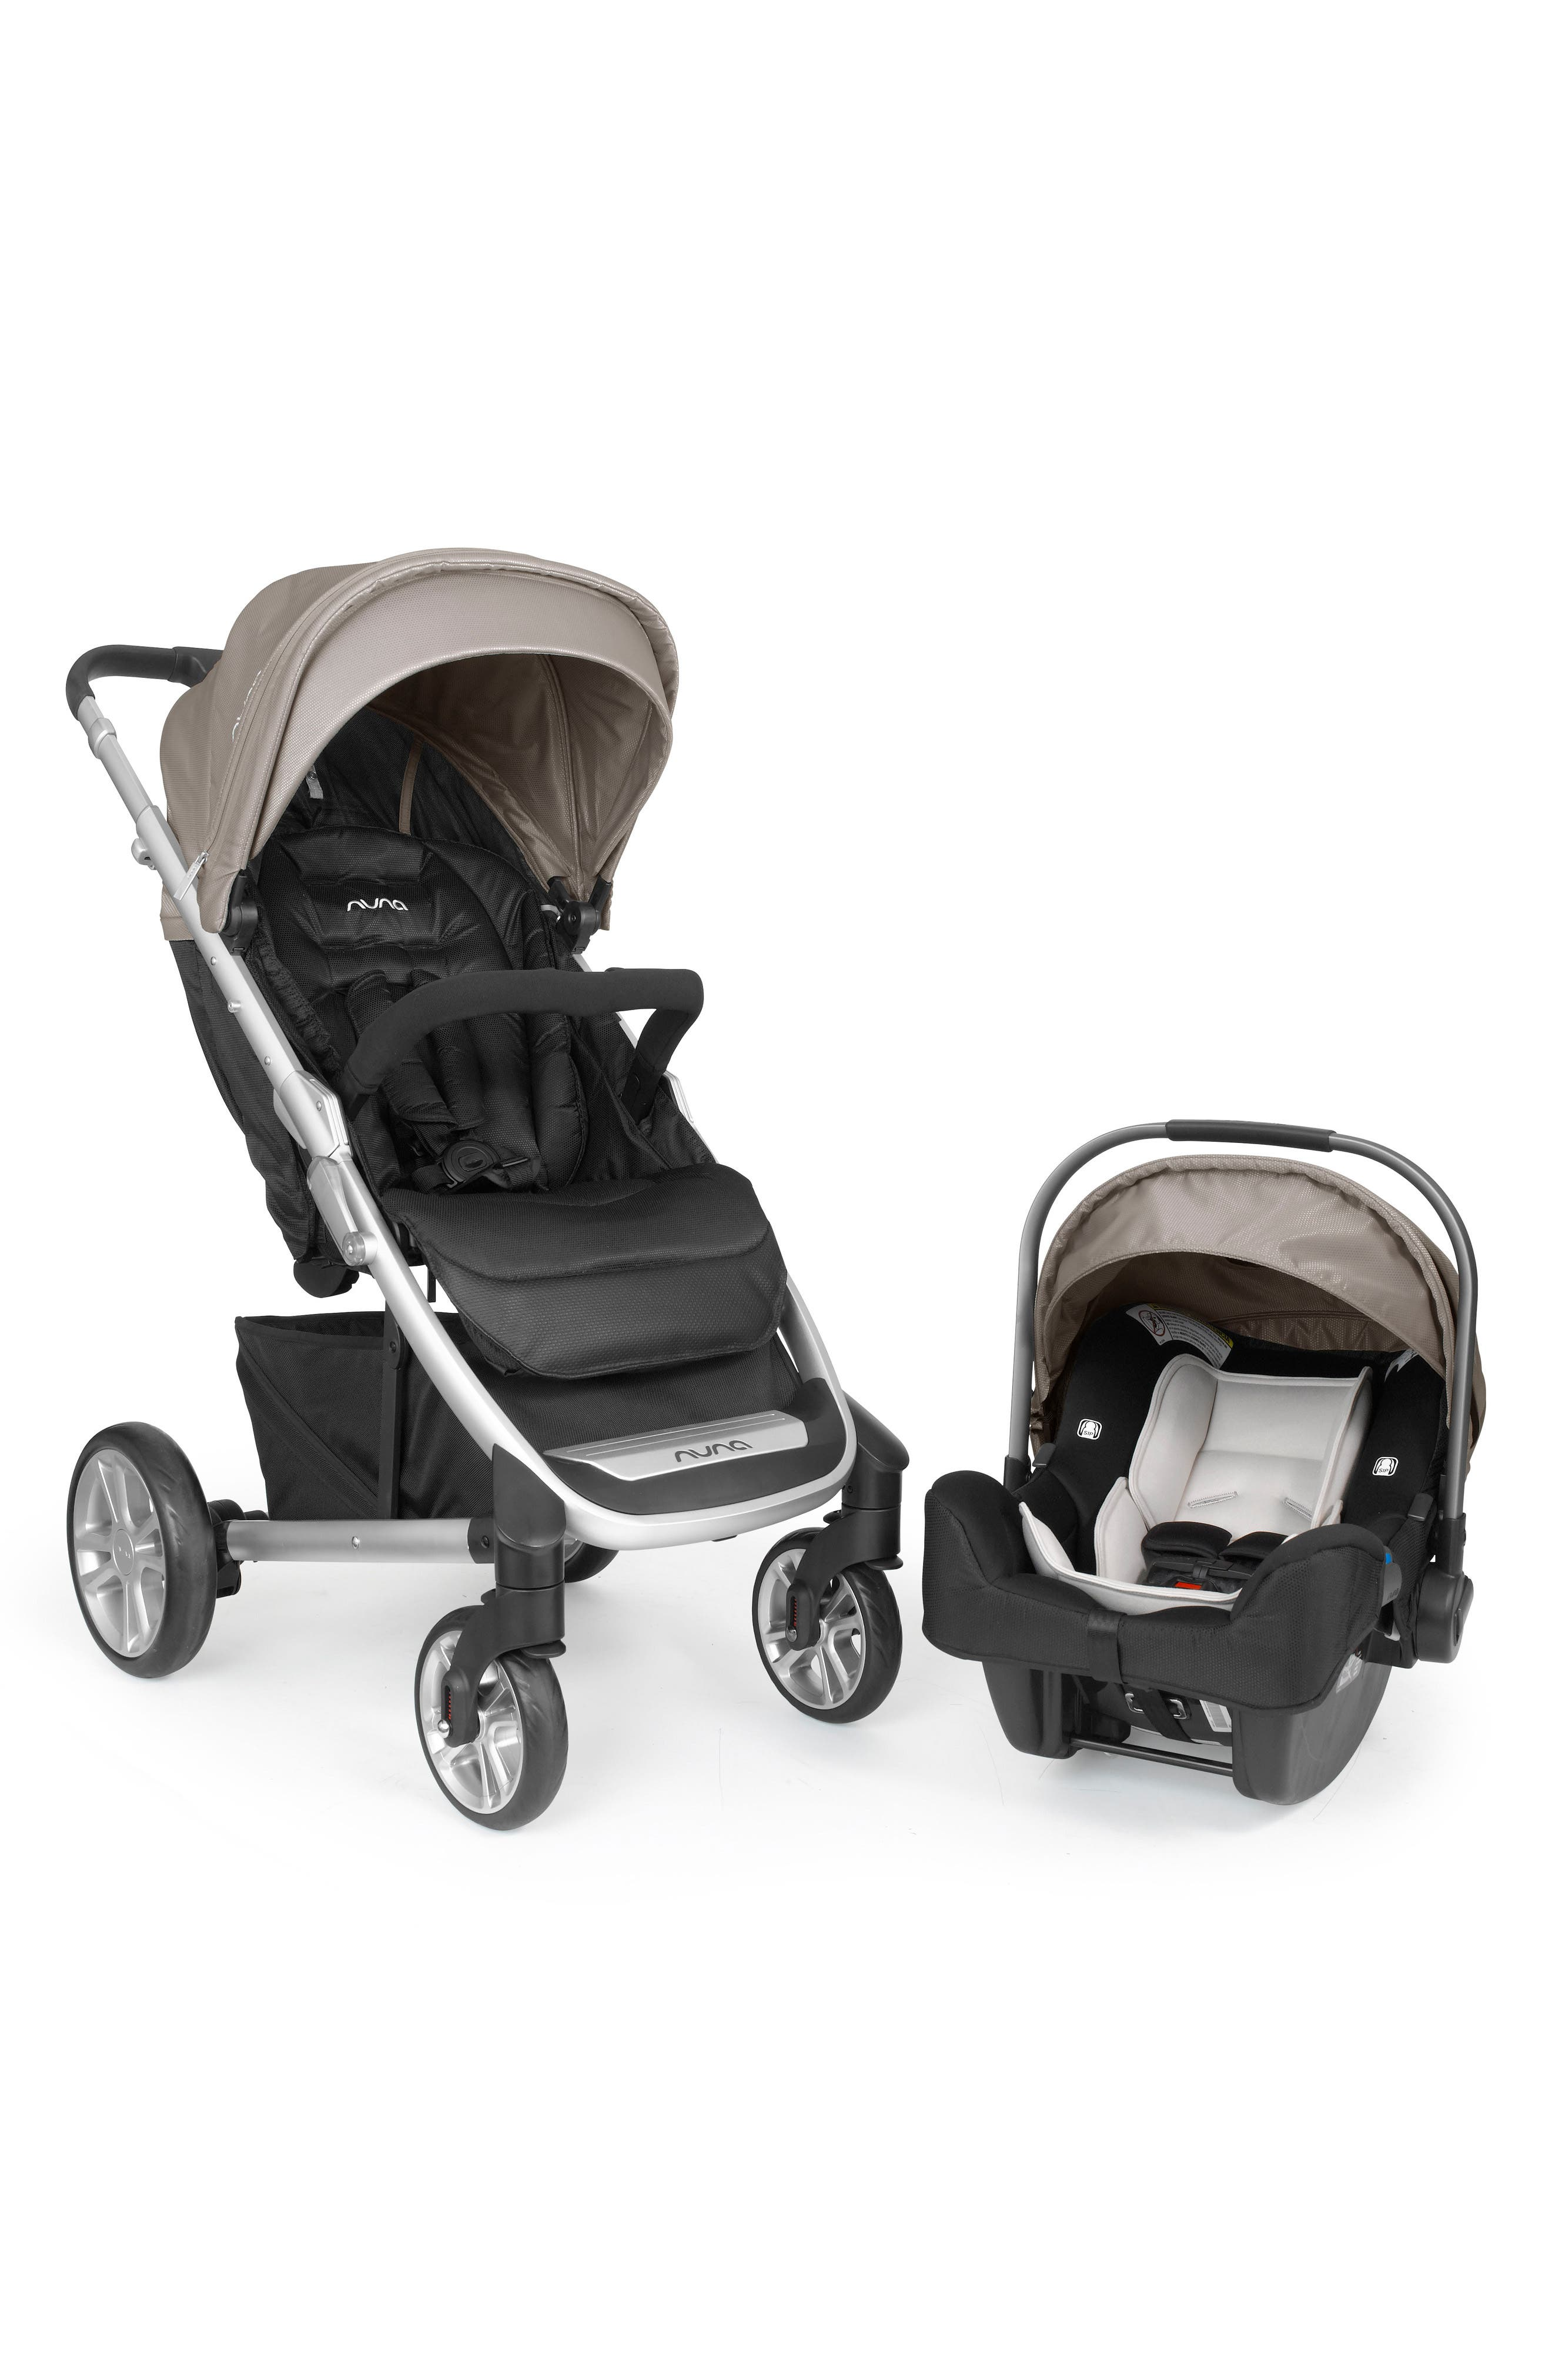 Nuna Tavo Travel System Stroller Car Seat Amp Base